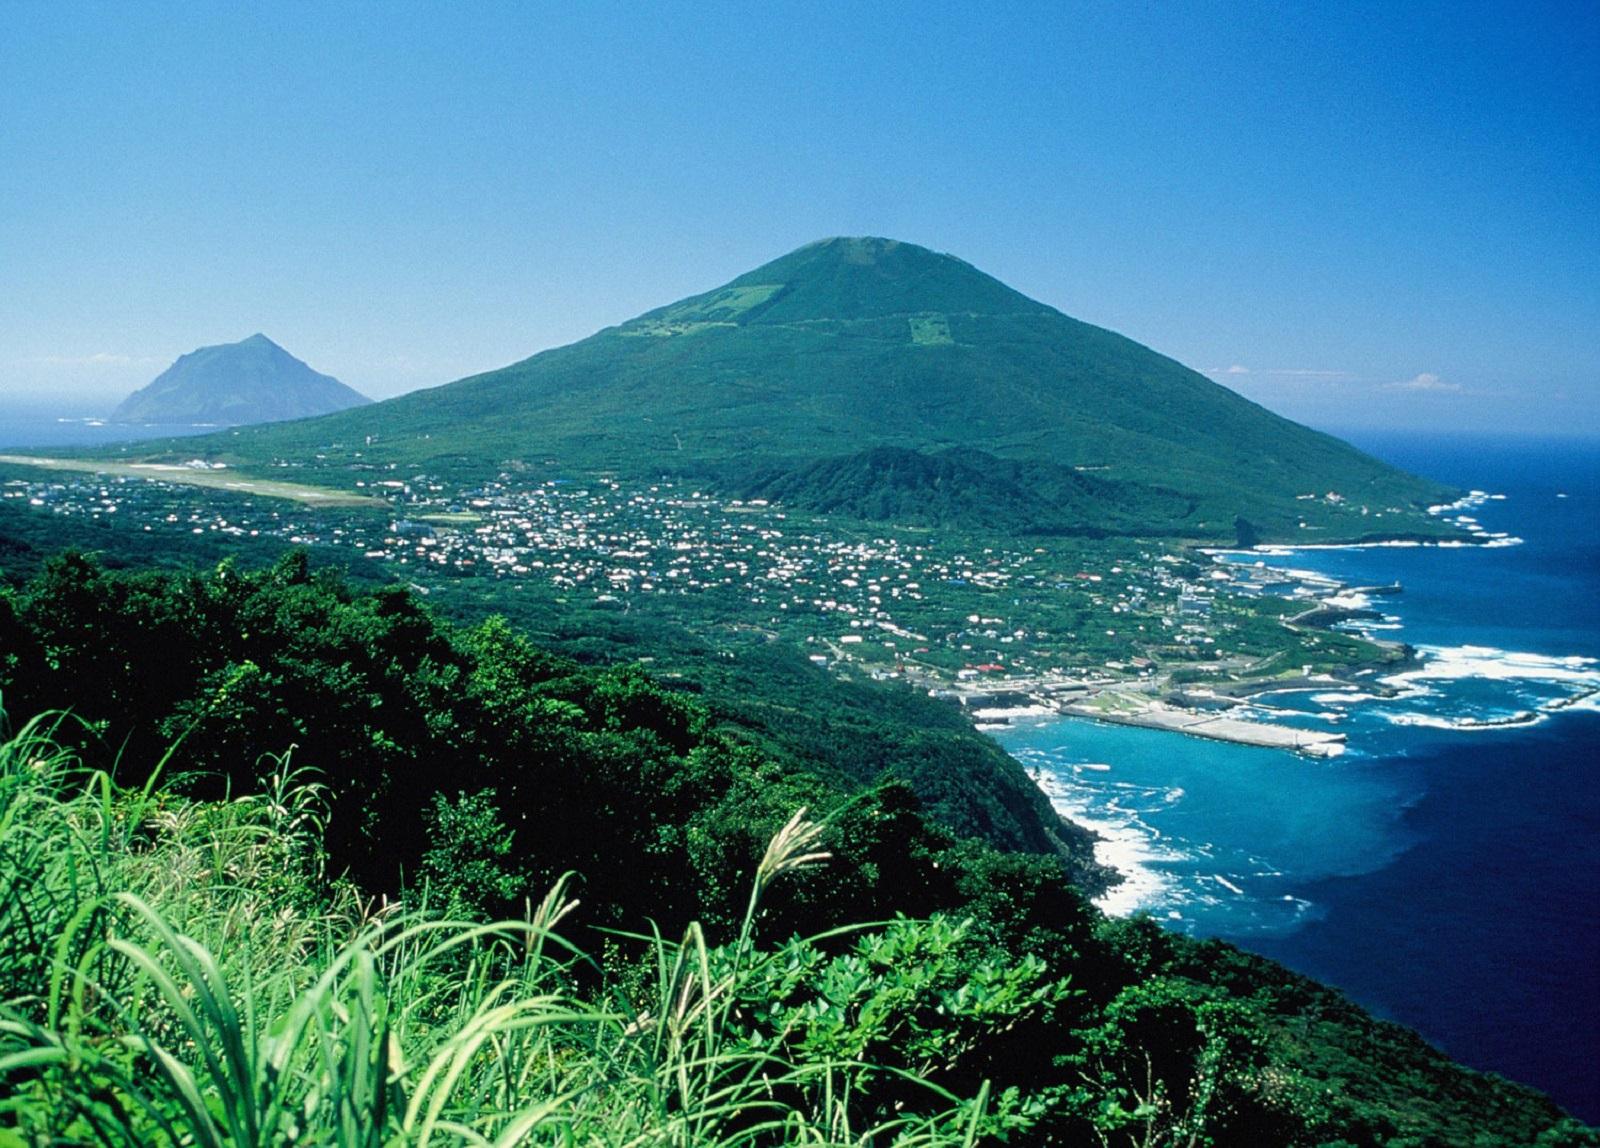 hachijojima, isla de Japón